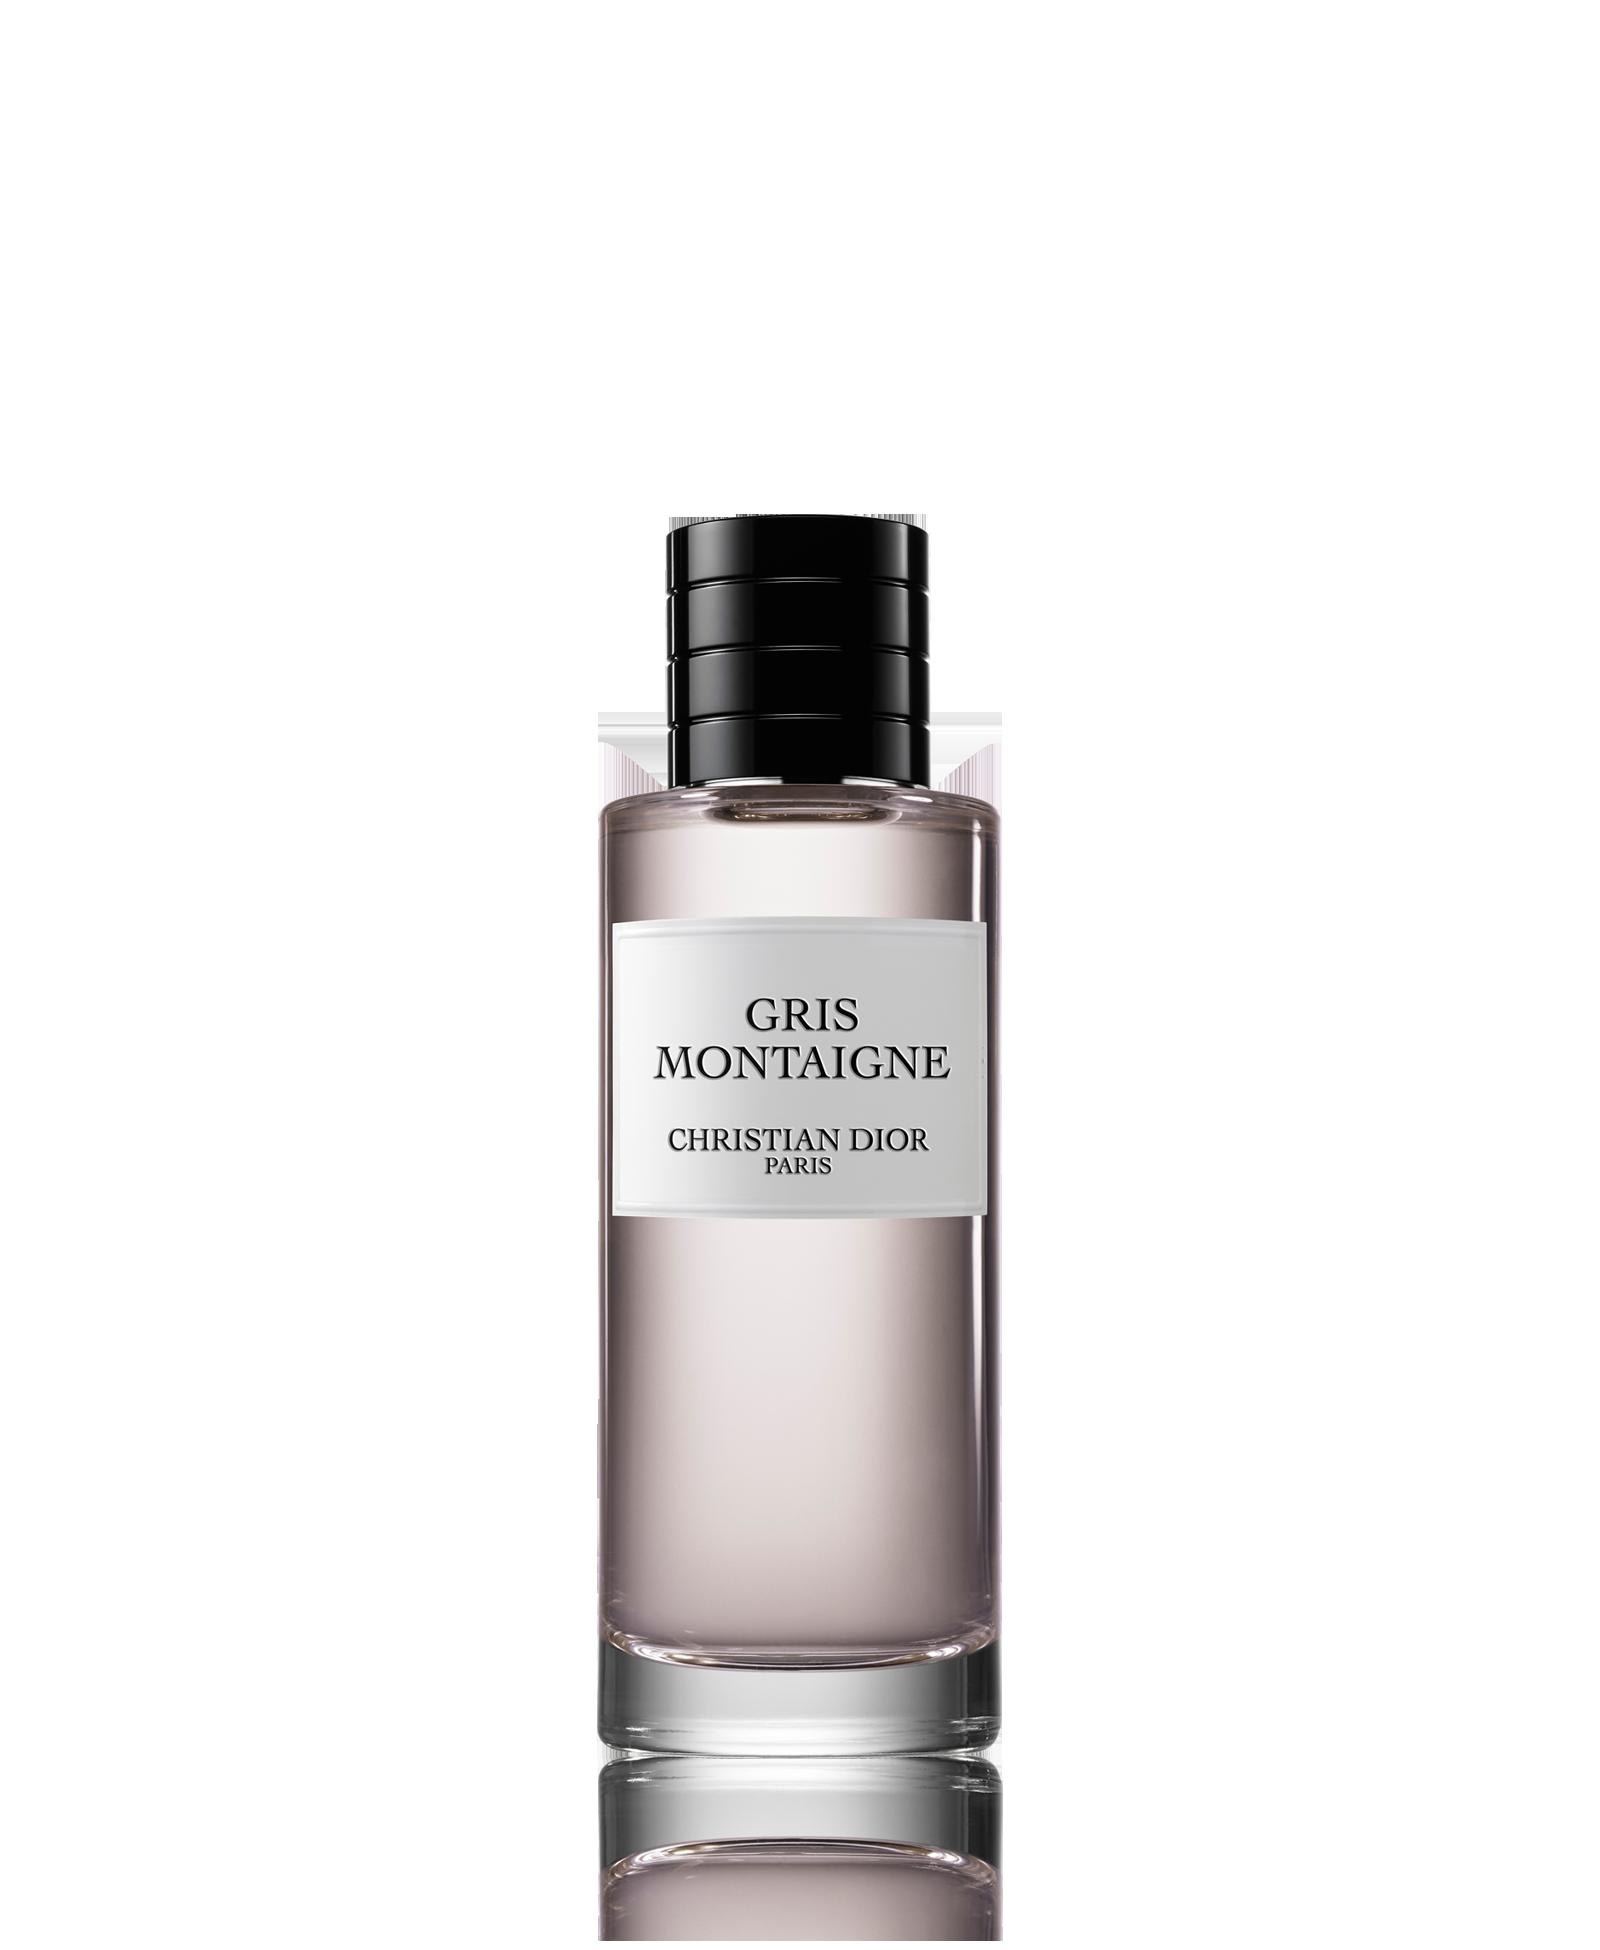 Gris Perfume Parfum Dior Fragrance